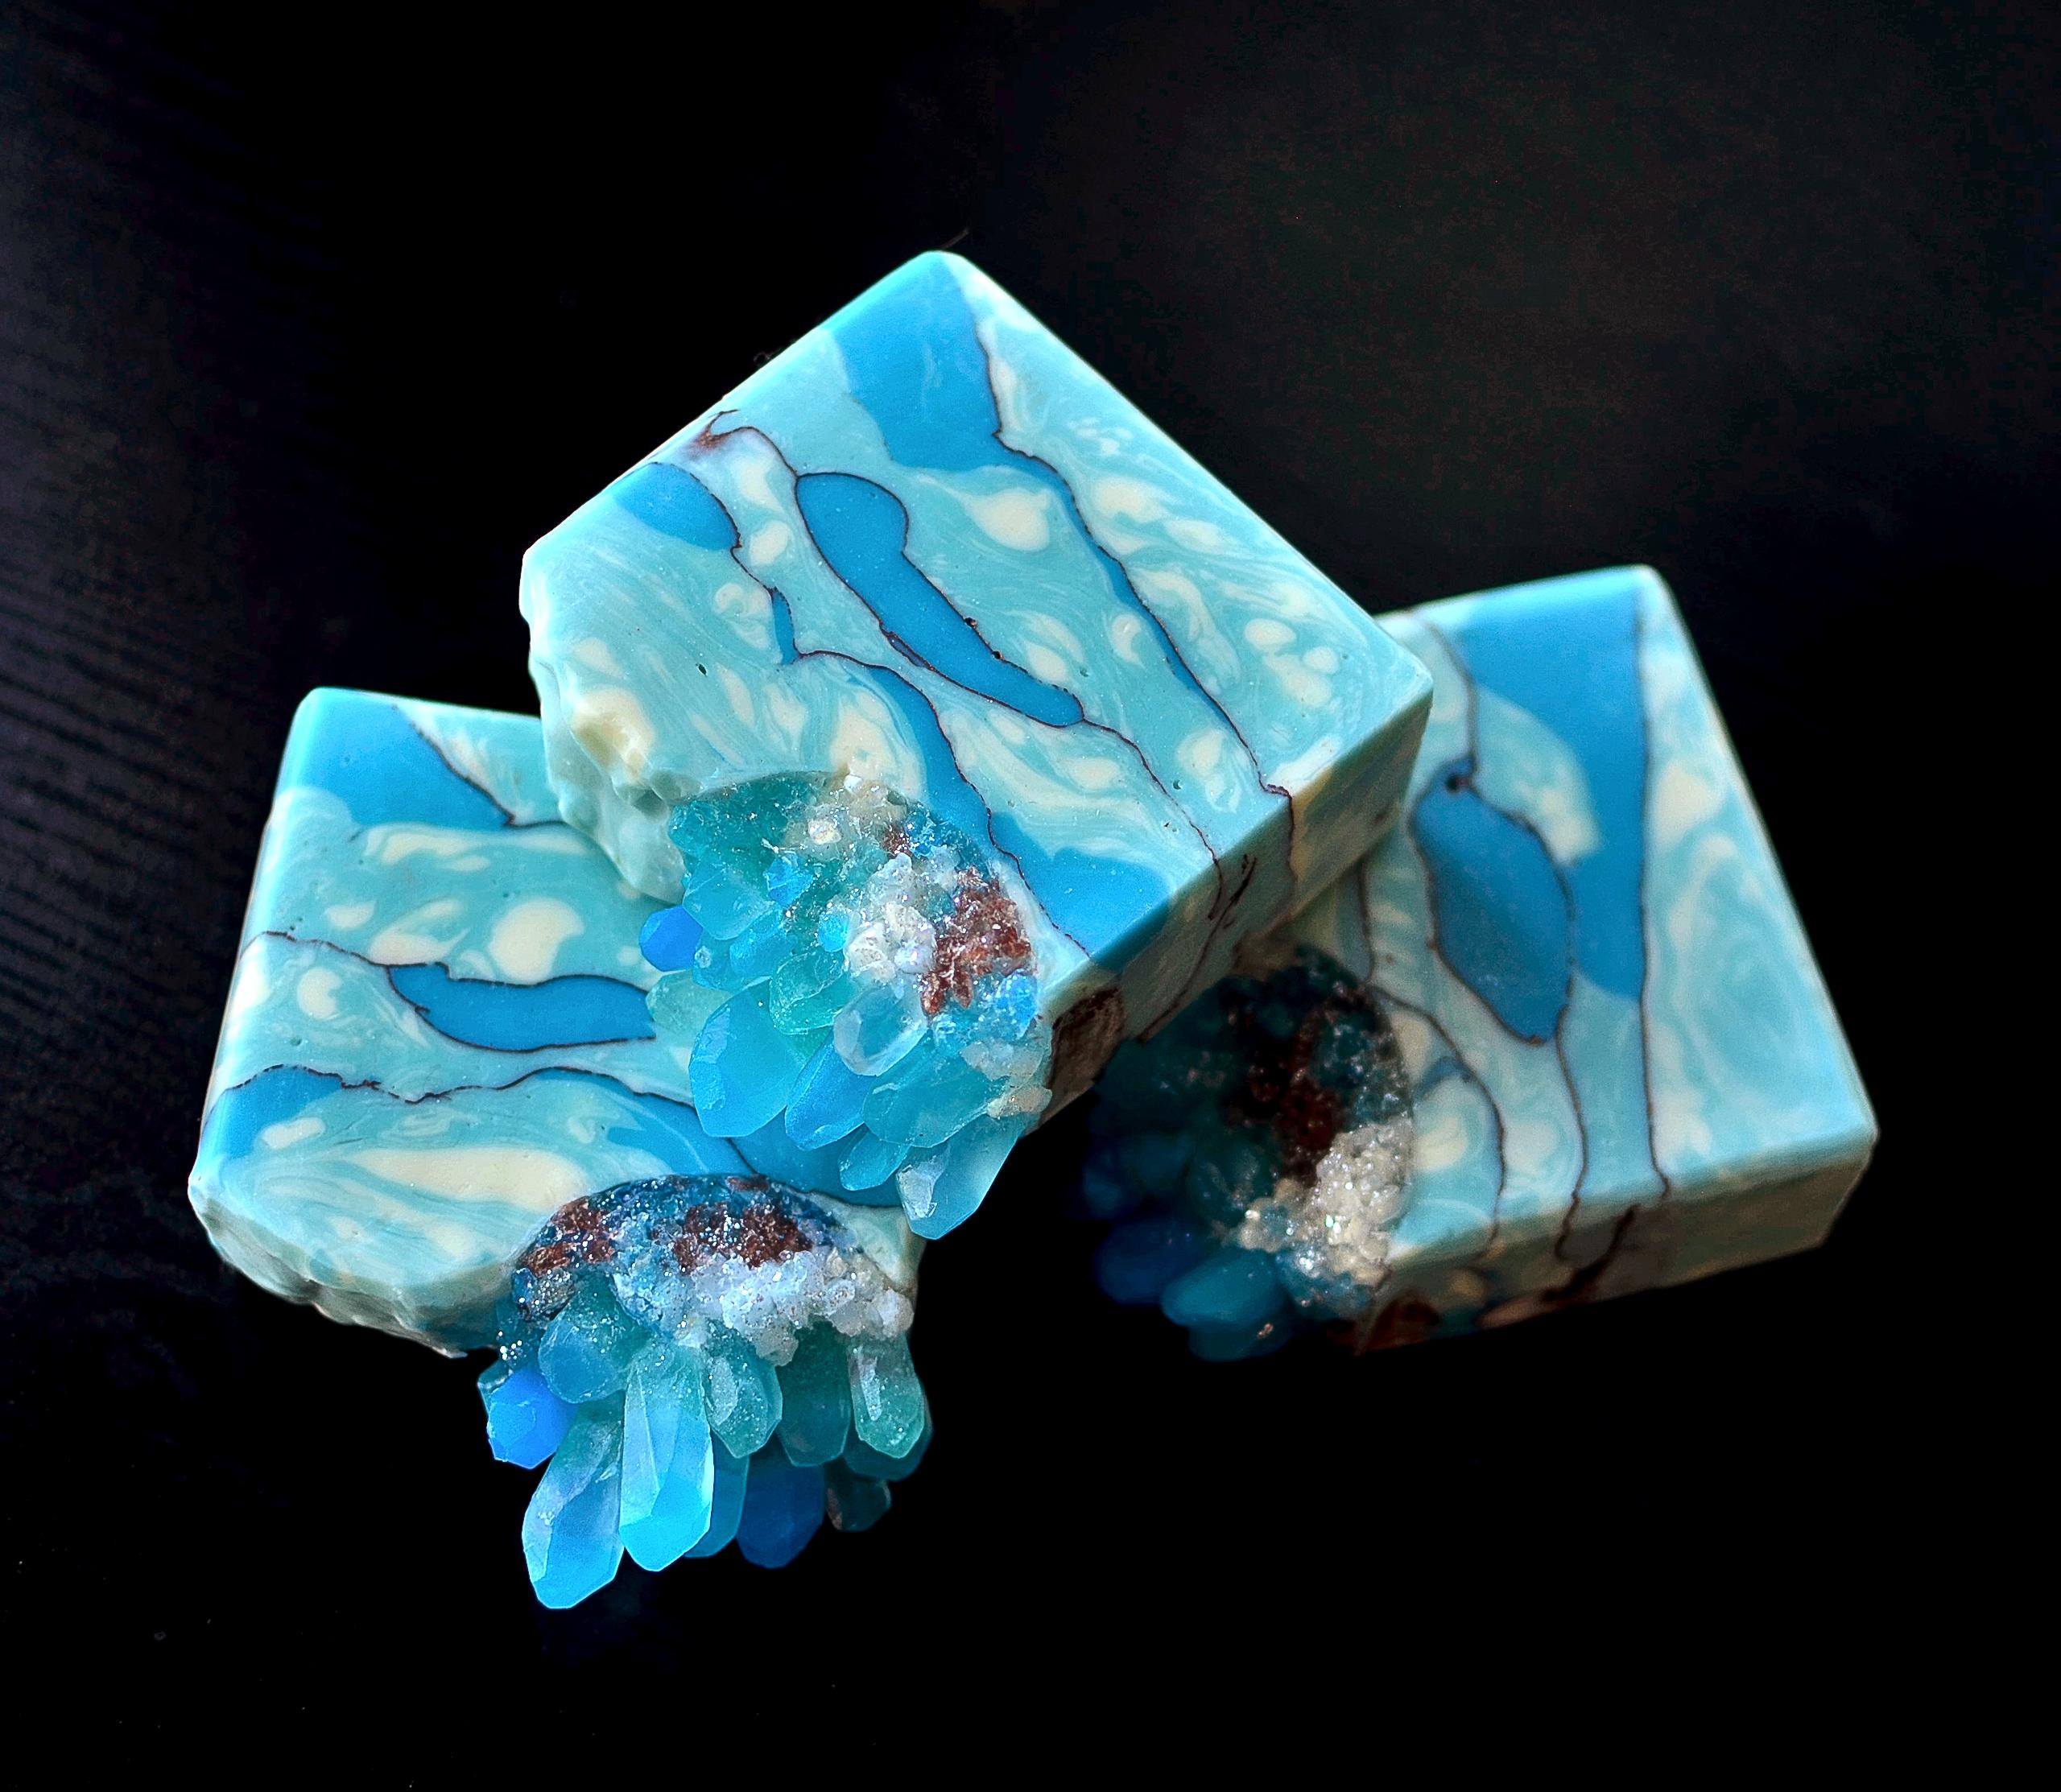 a healing stone